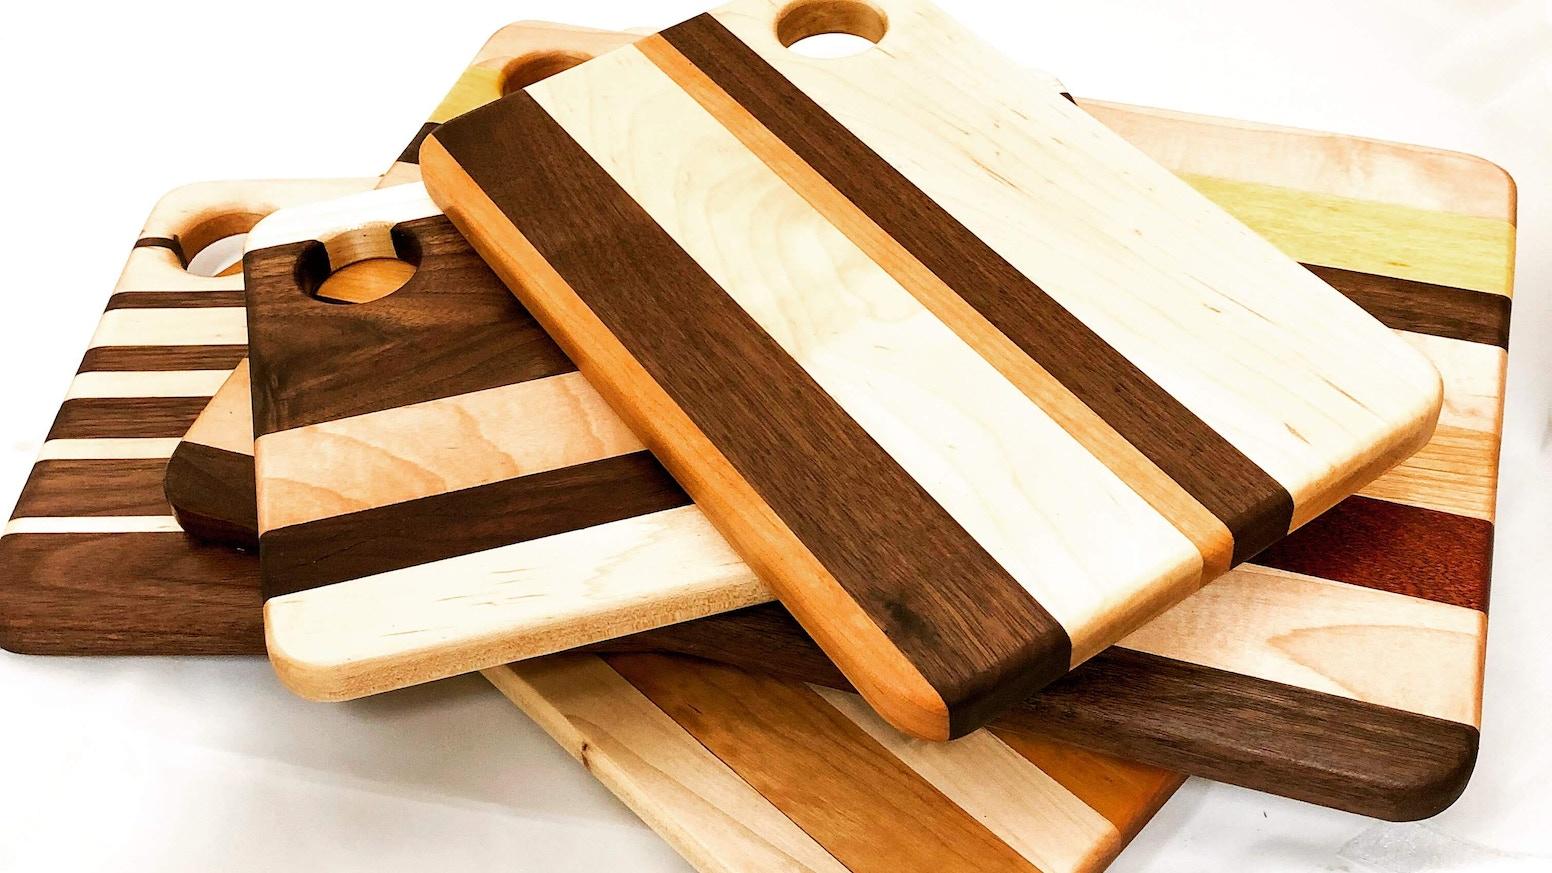 Handmade Hard Wood Cutting Boards With